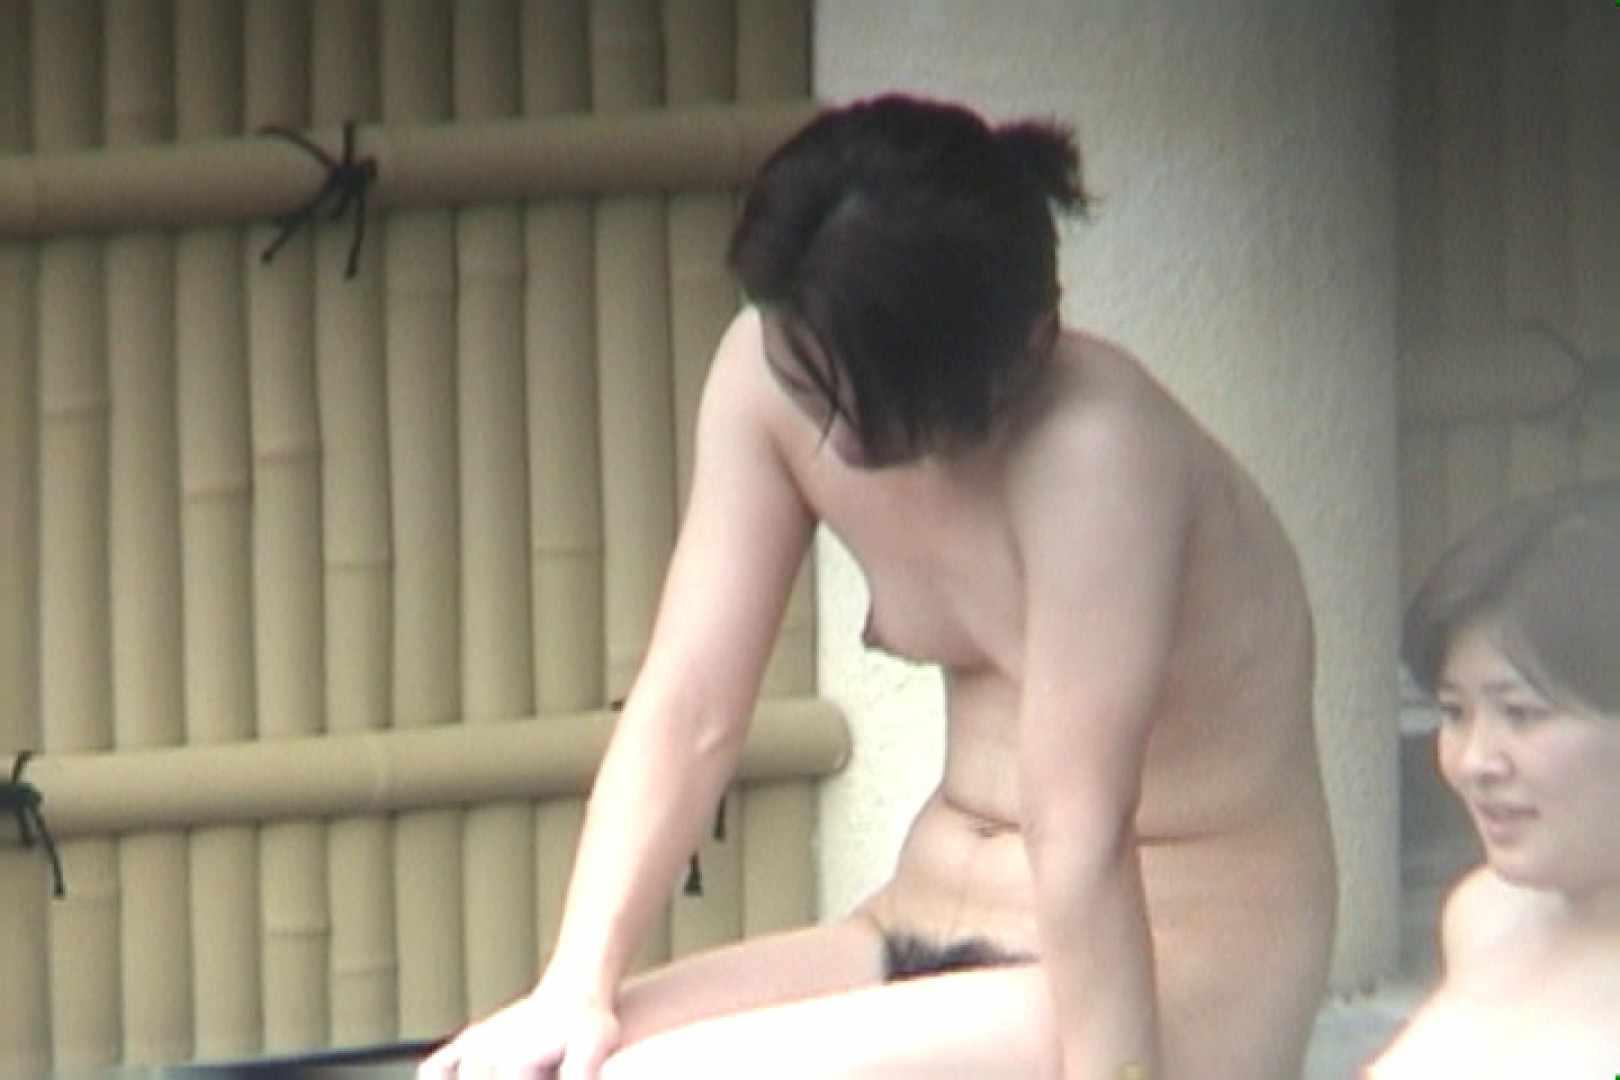 Aquaな露天風呂Vol.558 盗撮師作品  86pic 75